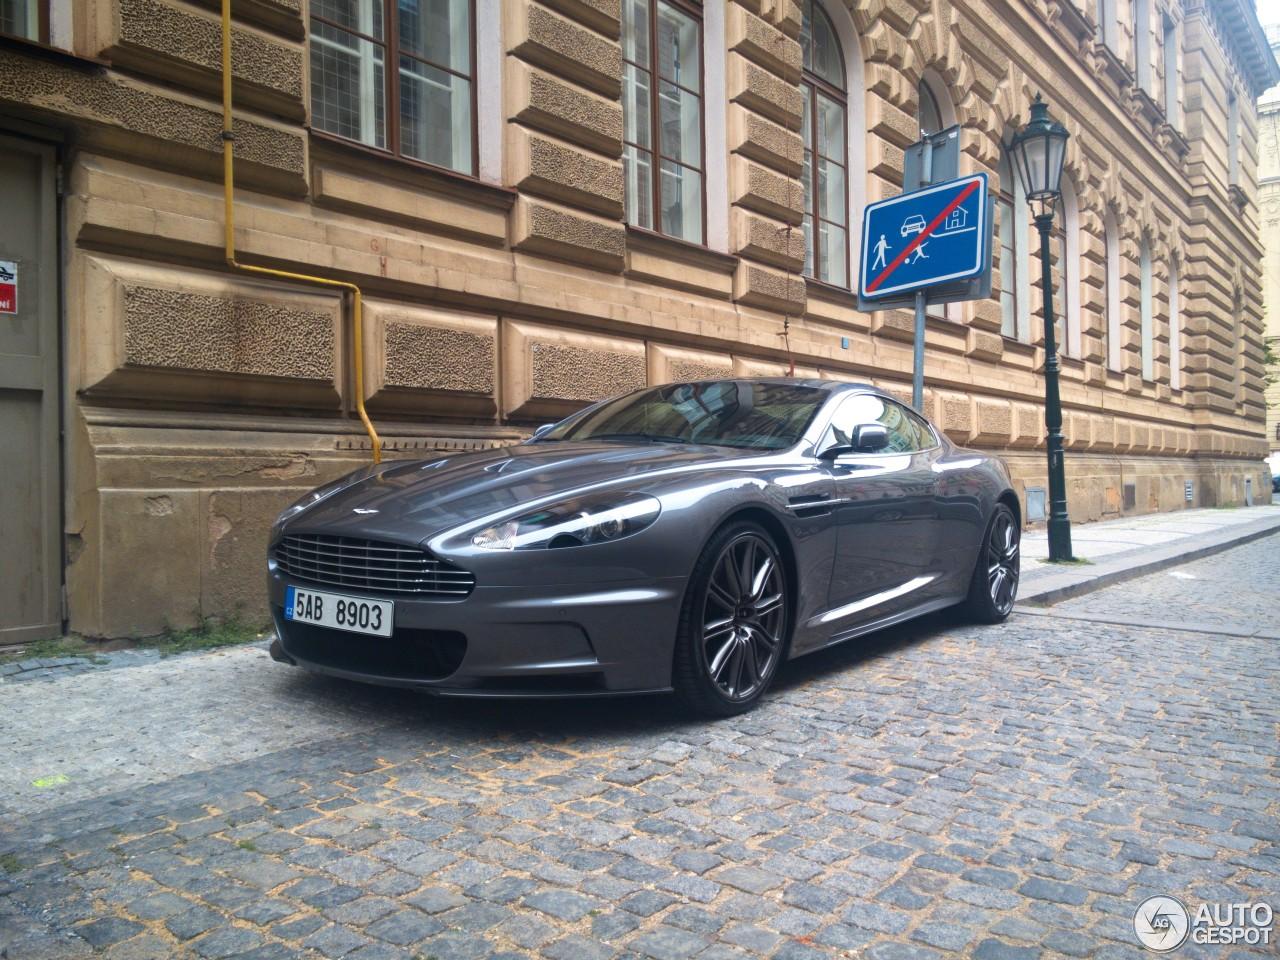 Aston Martin Dbs 27 June 2017 Autogespot